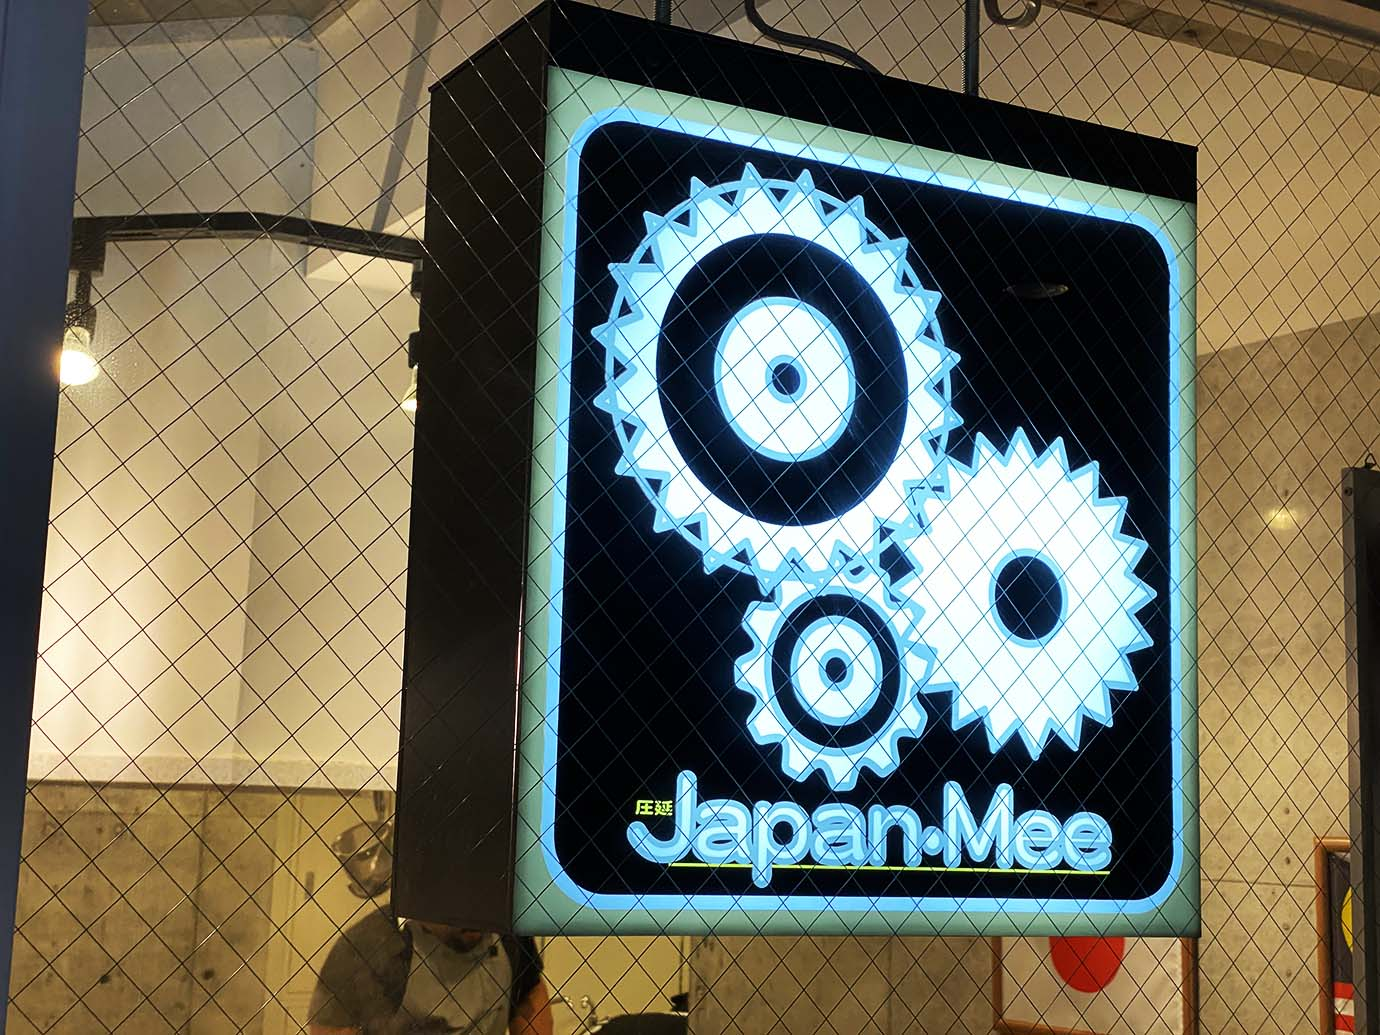 shimokitazawa-atsuen-japan-mee15